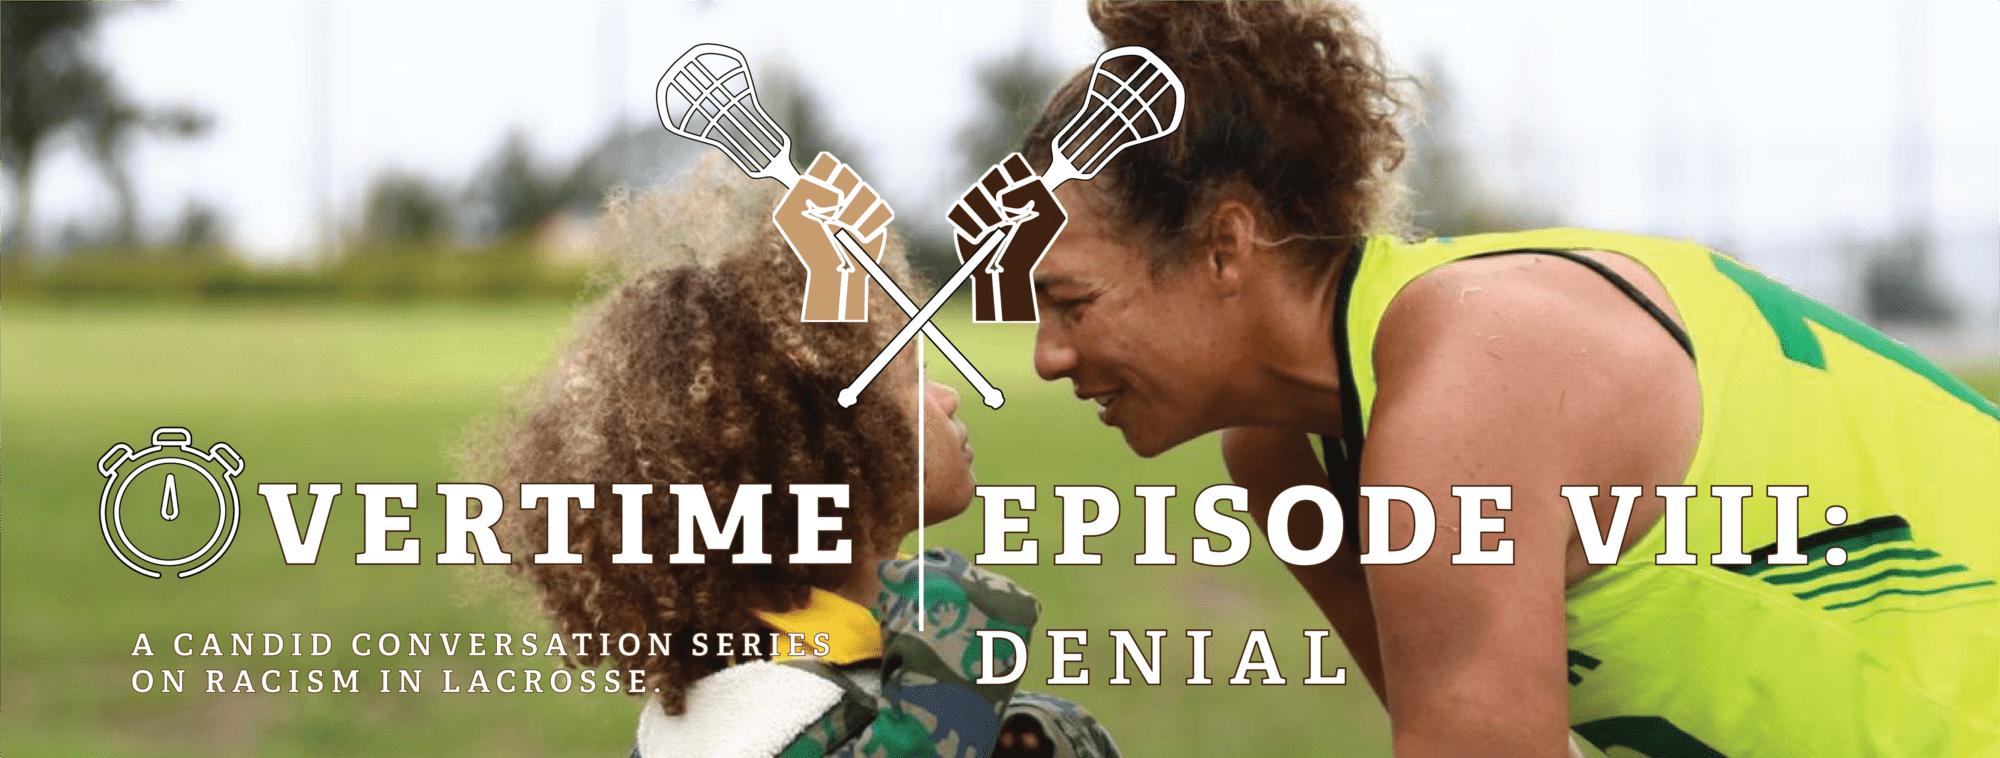 Overtime Episode 8 - The Denial